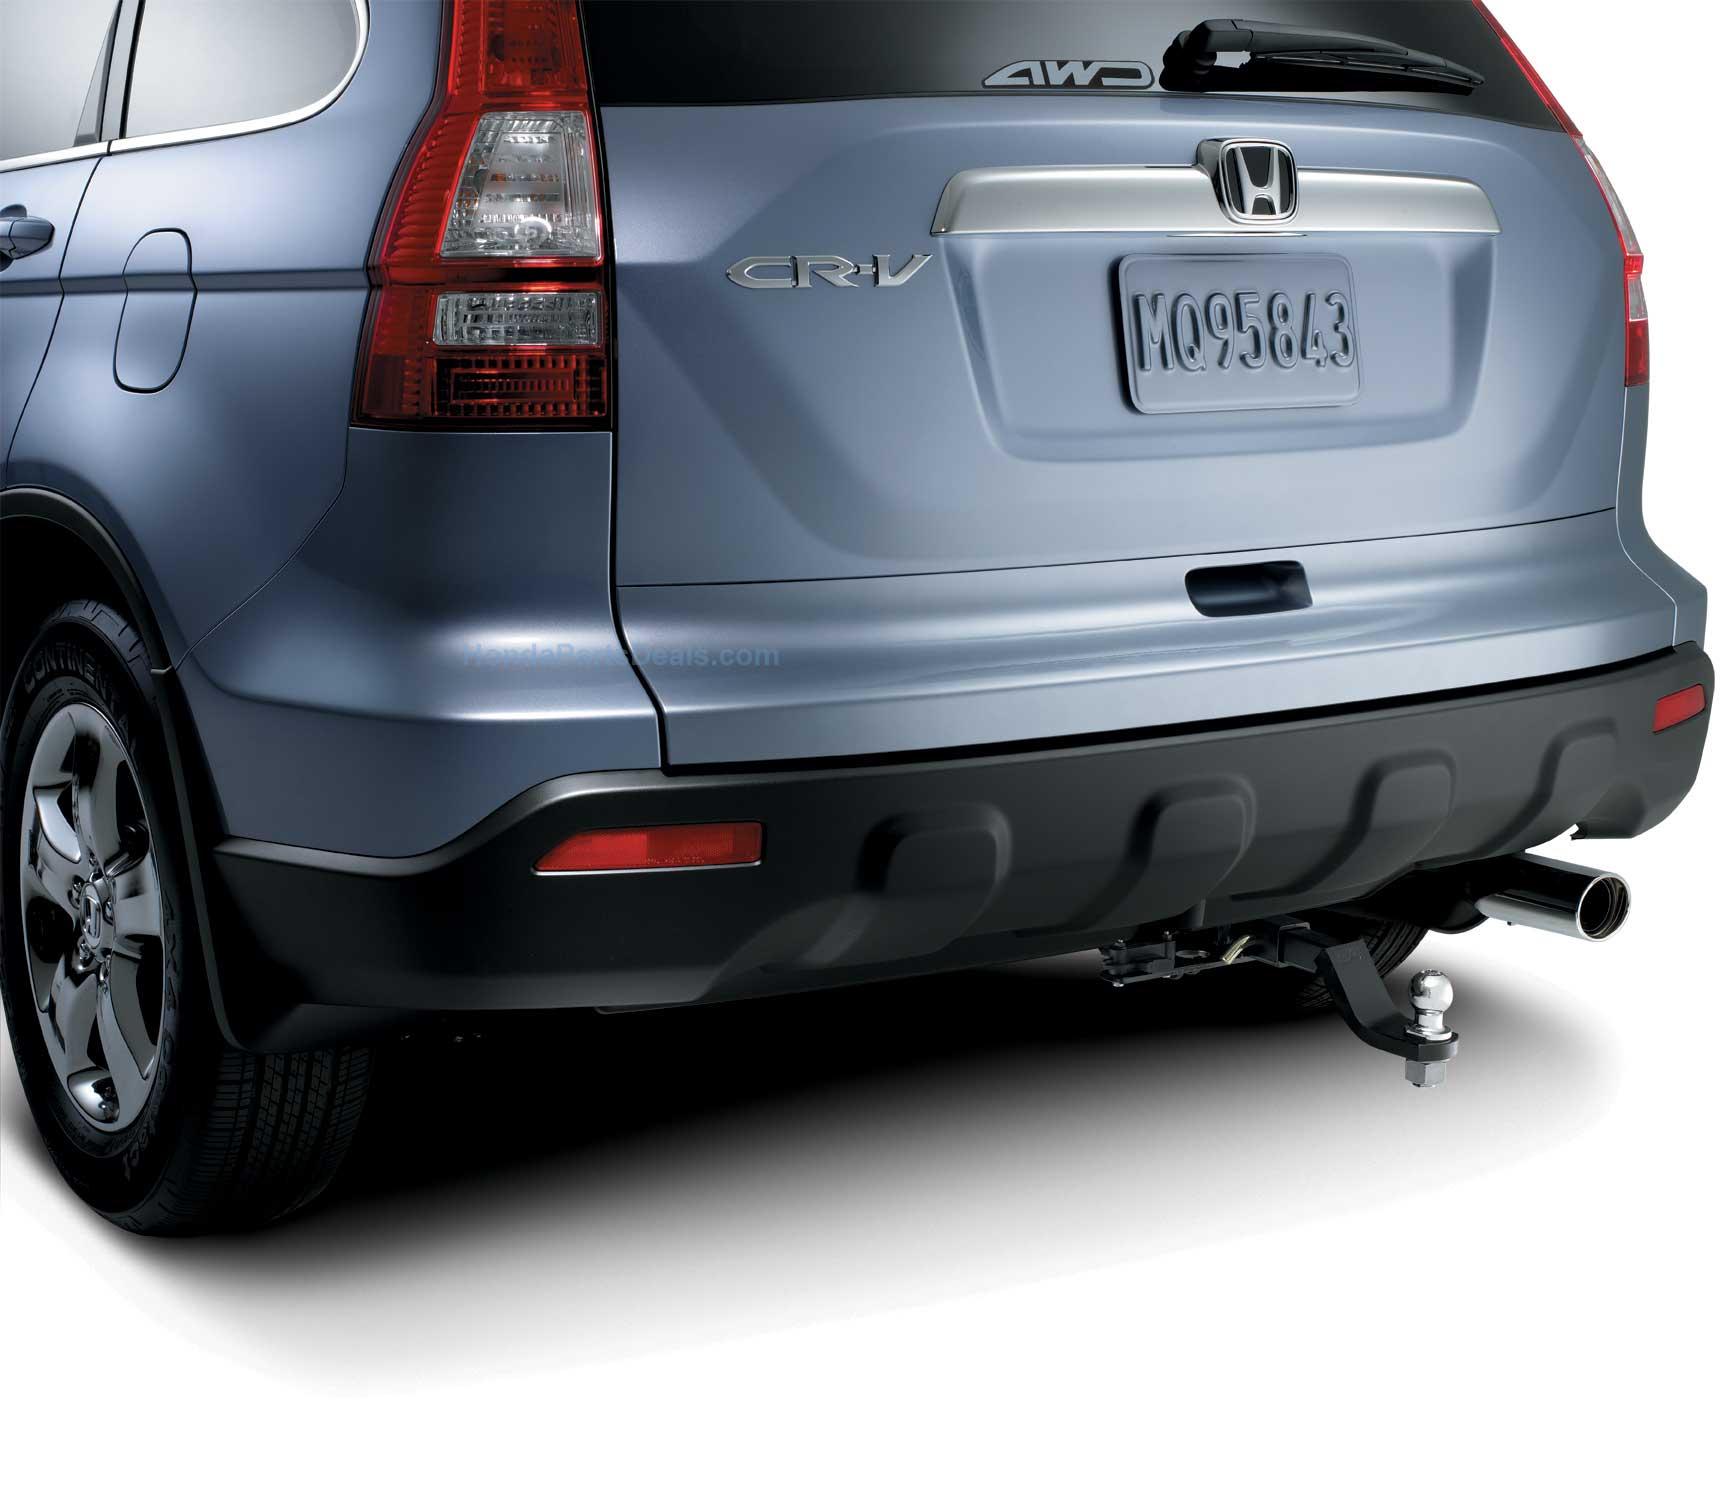 2011 Honda Pilot Trailer Wiring Harness In Addition Honda Ridgeline